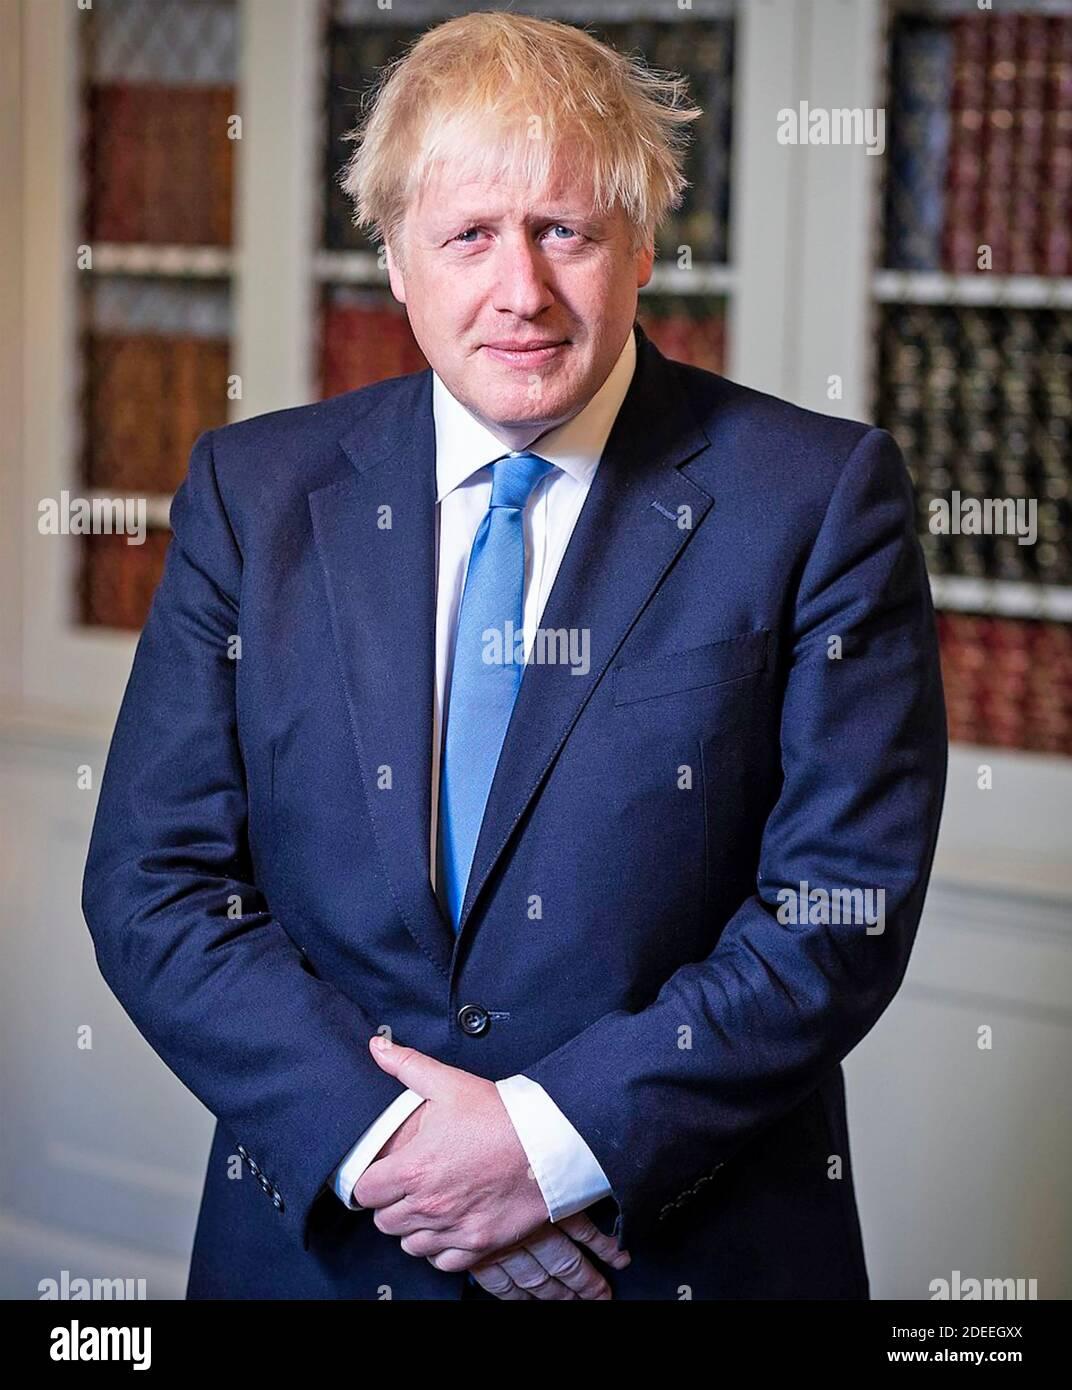 boris-johnson-english-conservative-politician-as-prime-minister-in-2019-2DEEGXX.jpg?profile=RESIZE_400x